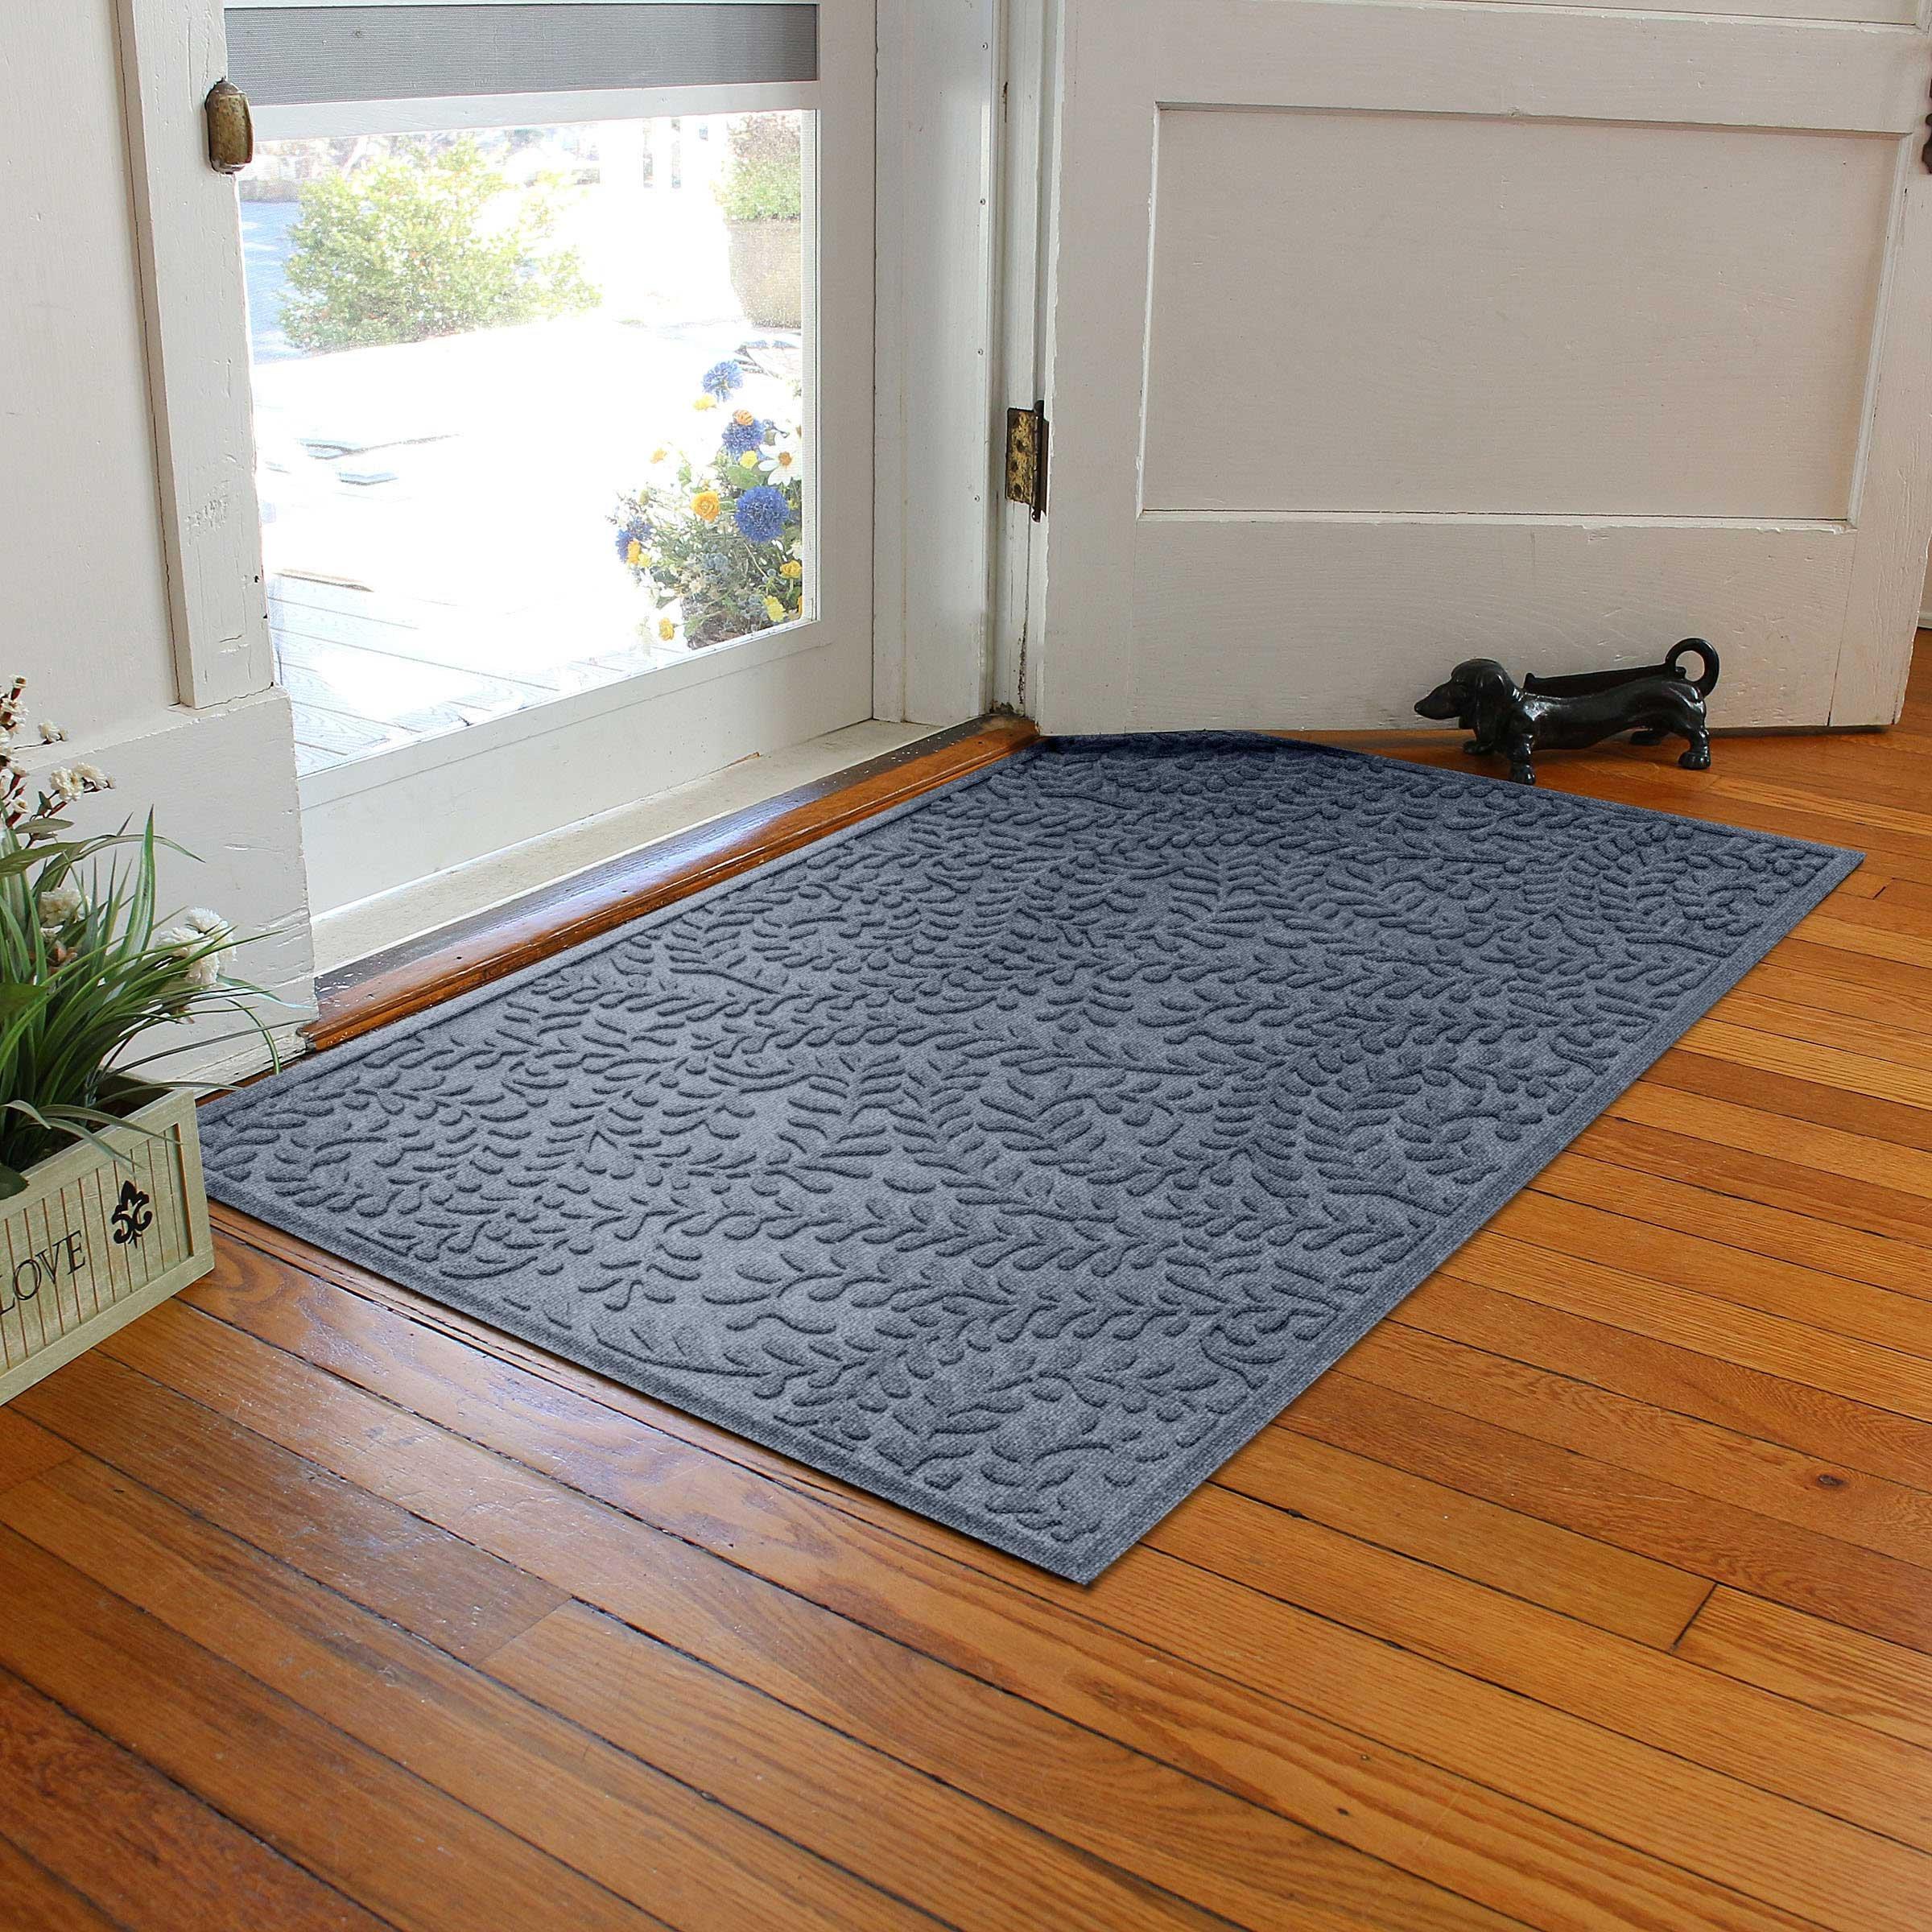 Bungalow Flooring Waterhog Indoor/Outdoor Doormat, 3' x 5', Skid Resistant, Easy to Clean, Catches Water and Debris, Boxwood Collection, Bluestone by Bungalow Flooring (Image #4)